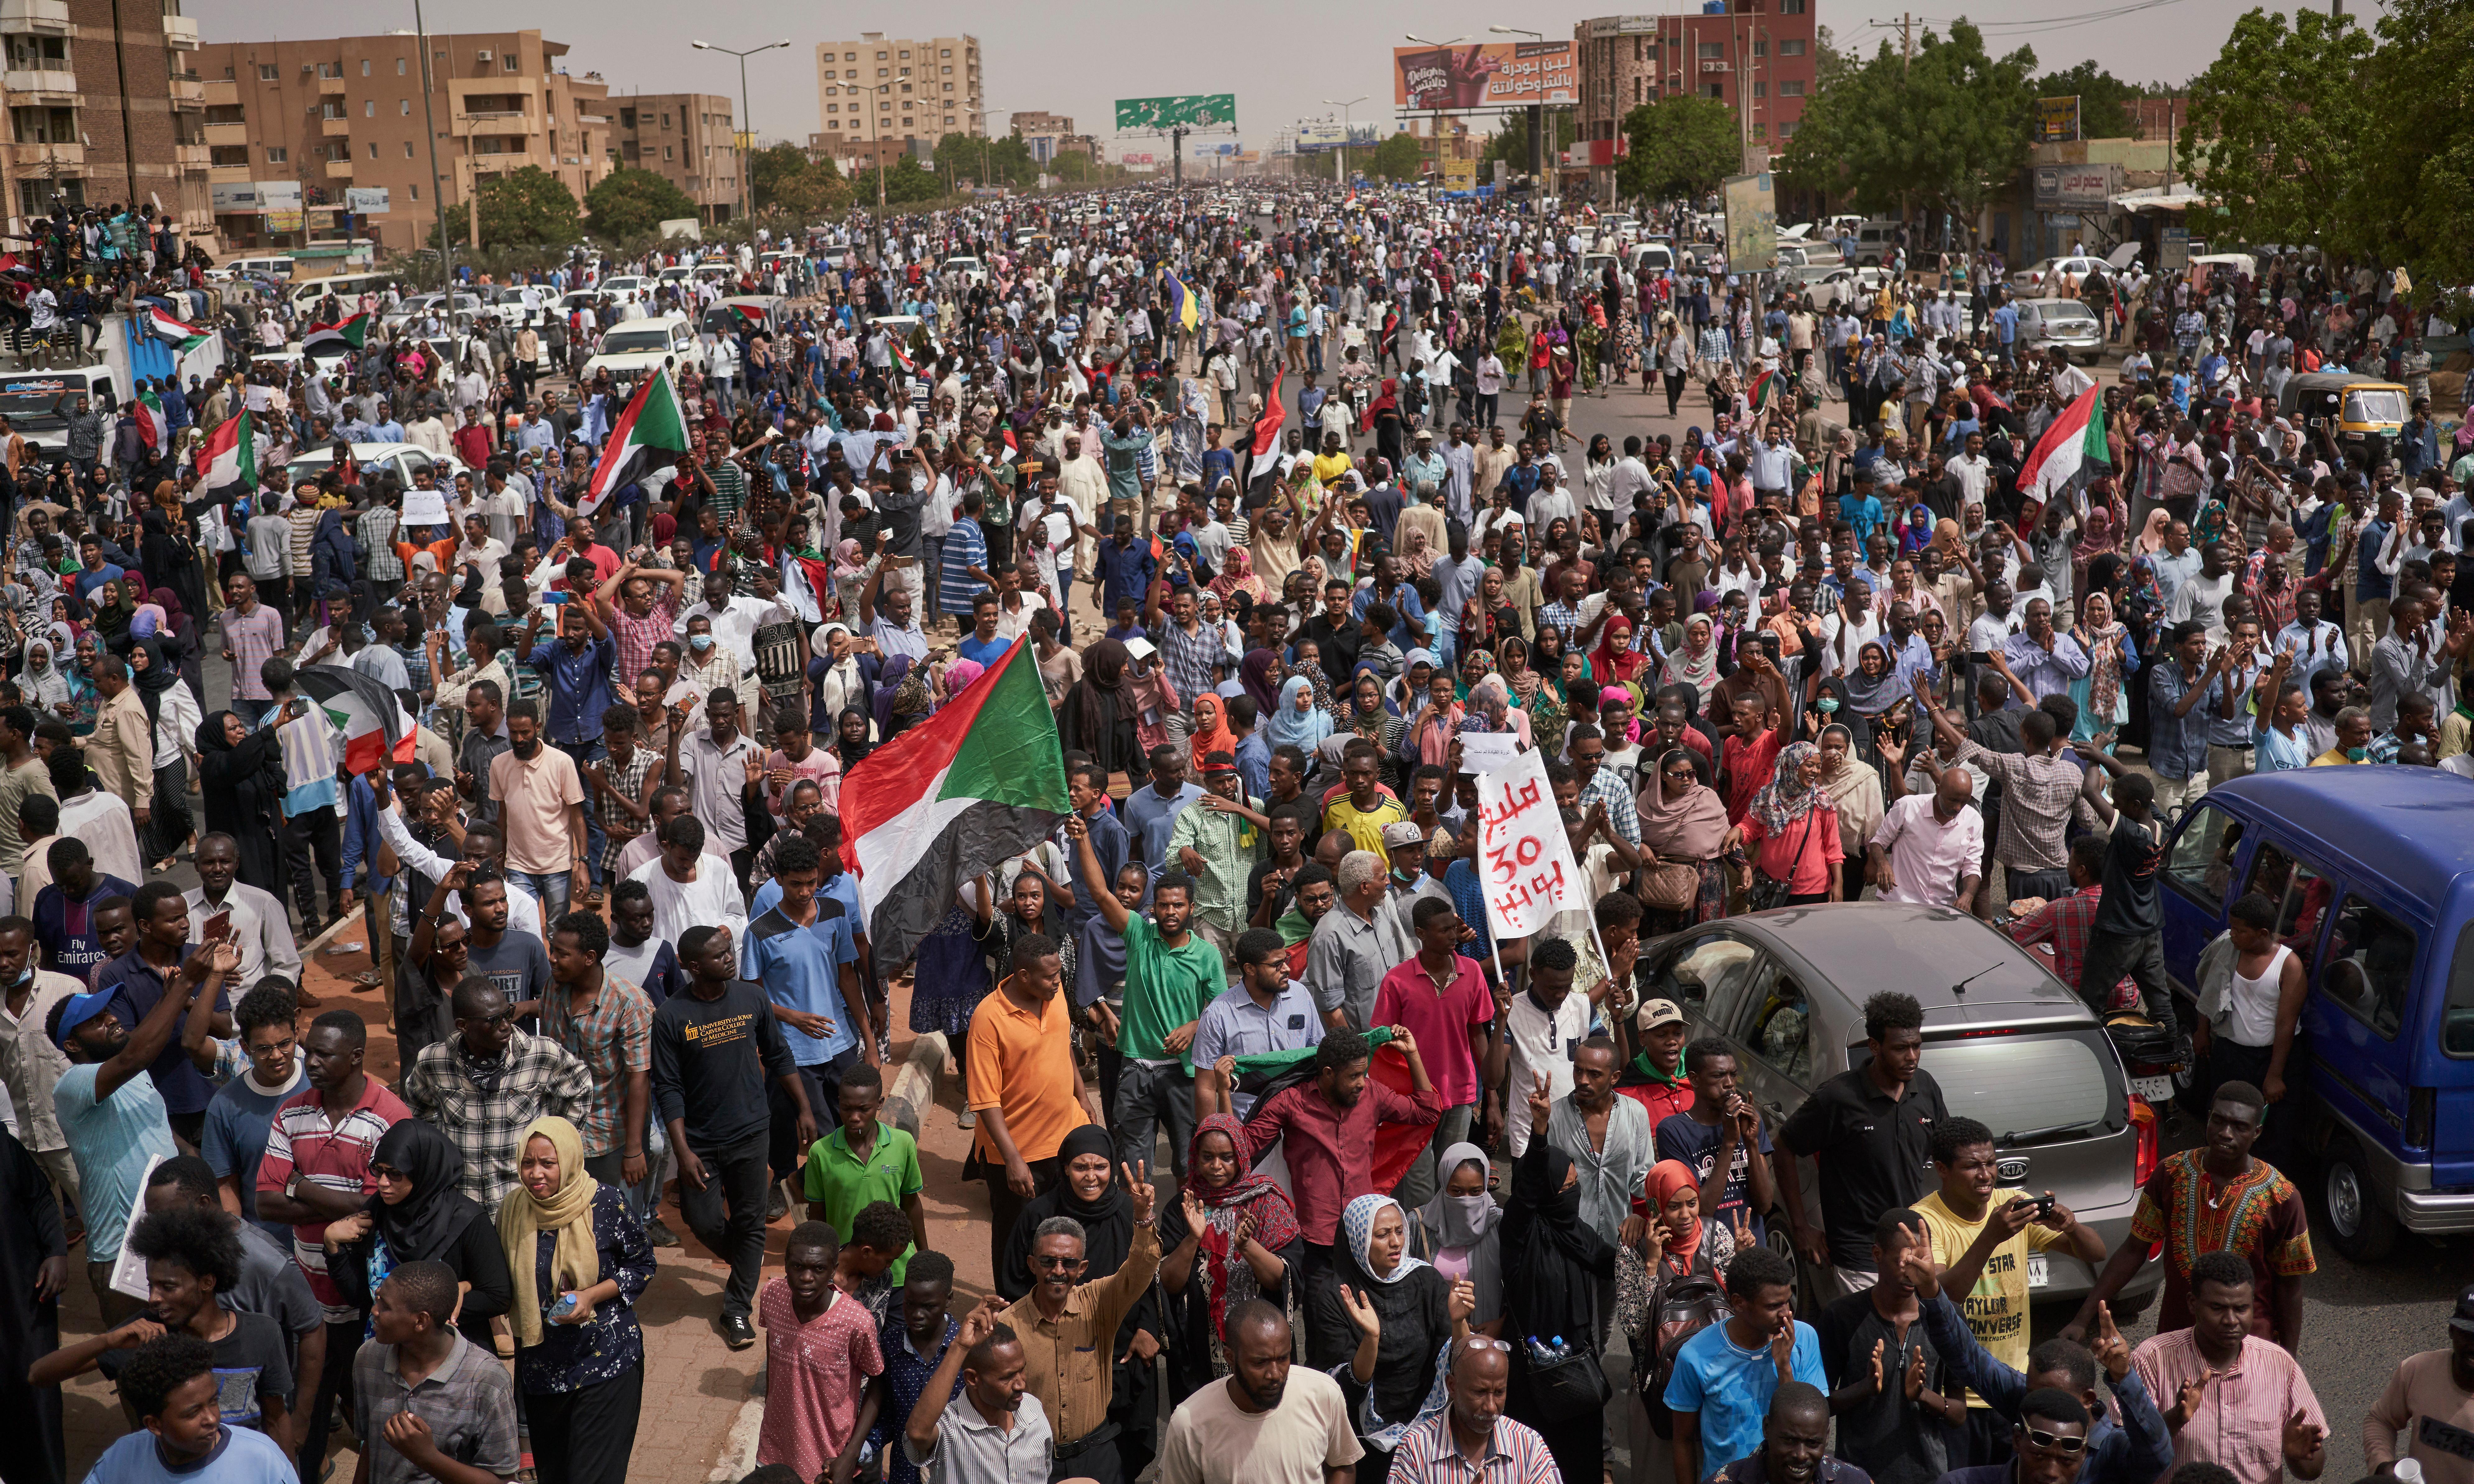 Sudan's military leaders accused of ordering massacre